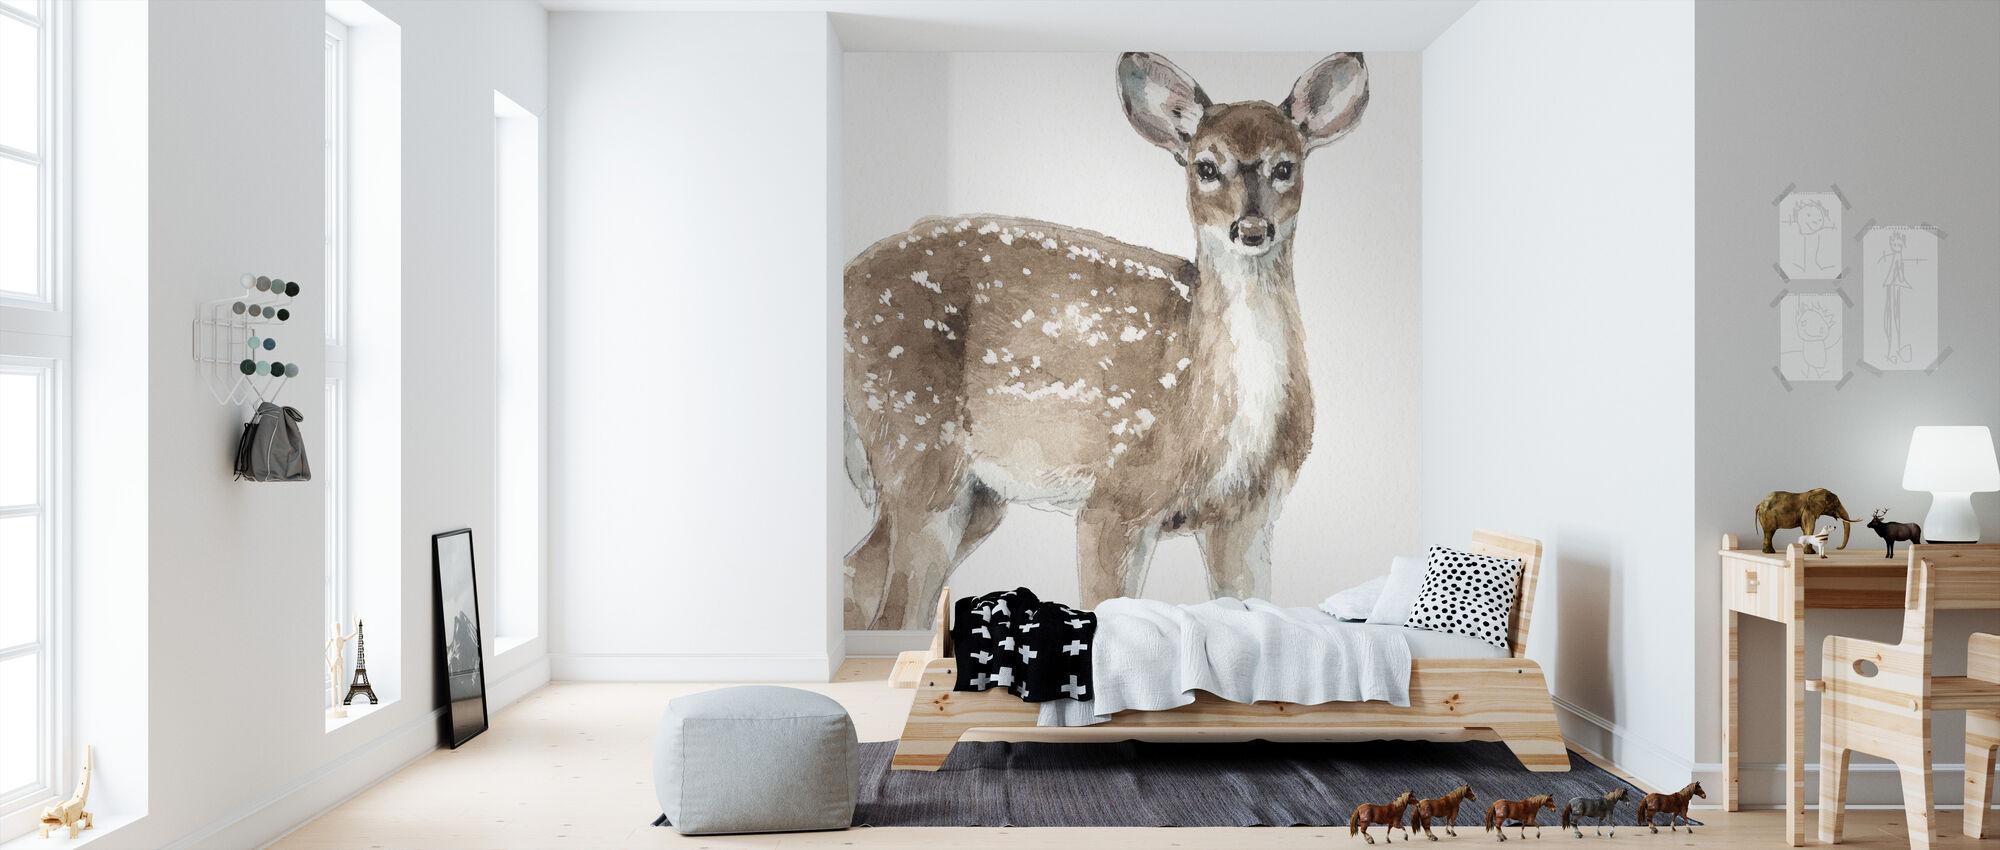 Forest Friends VI - Wallpaper - Kids Room